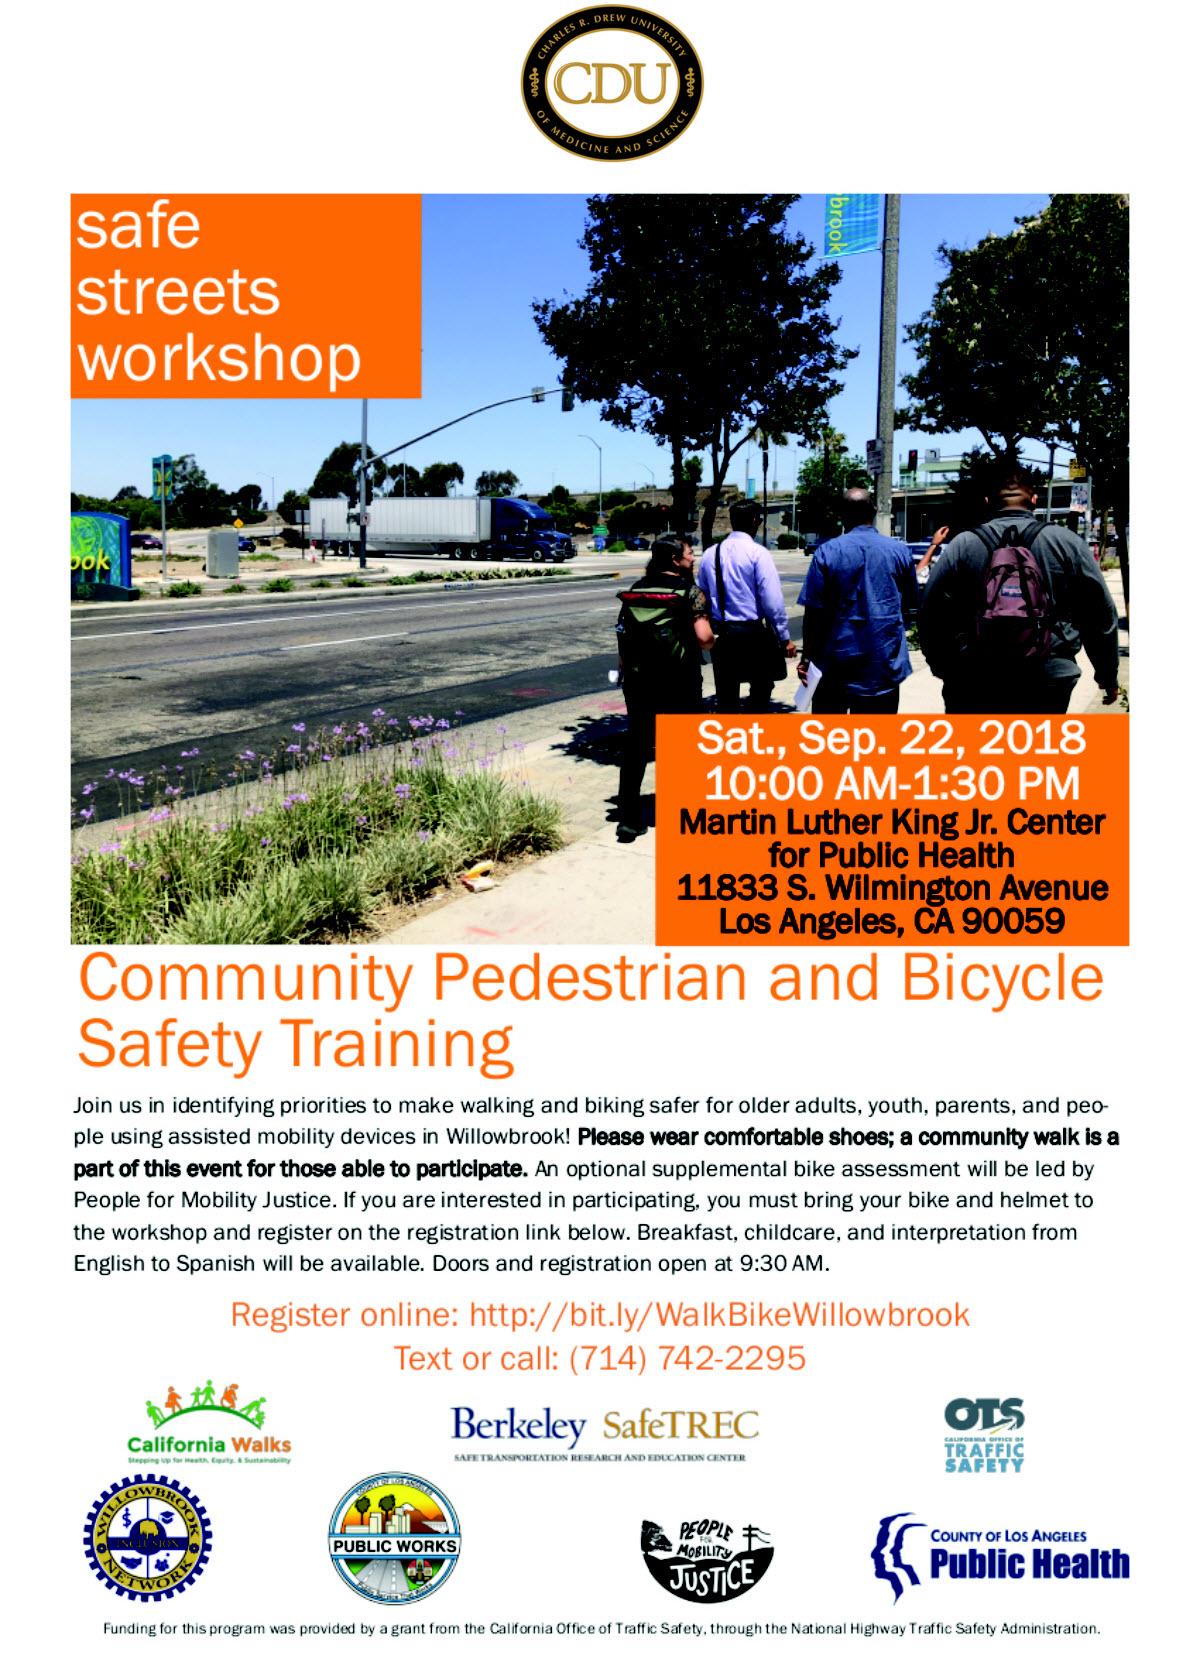 Pedestrian and bike safety training